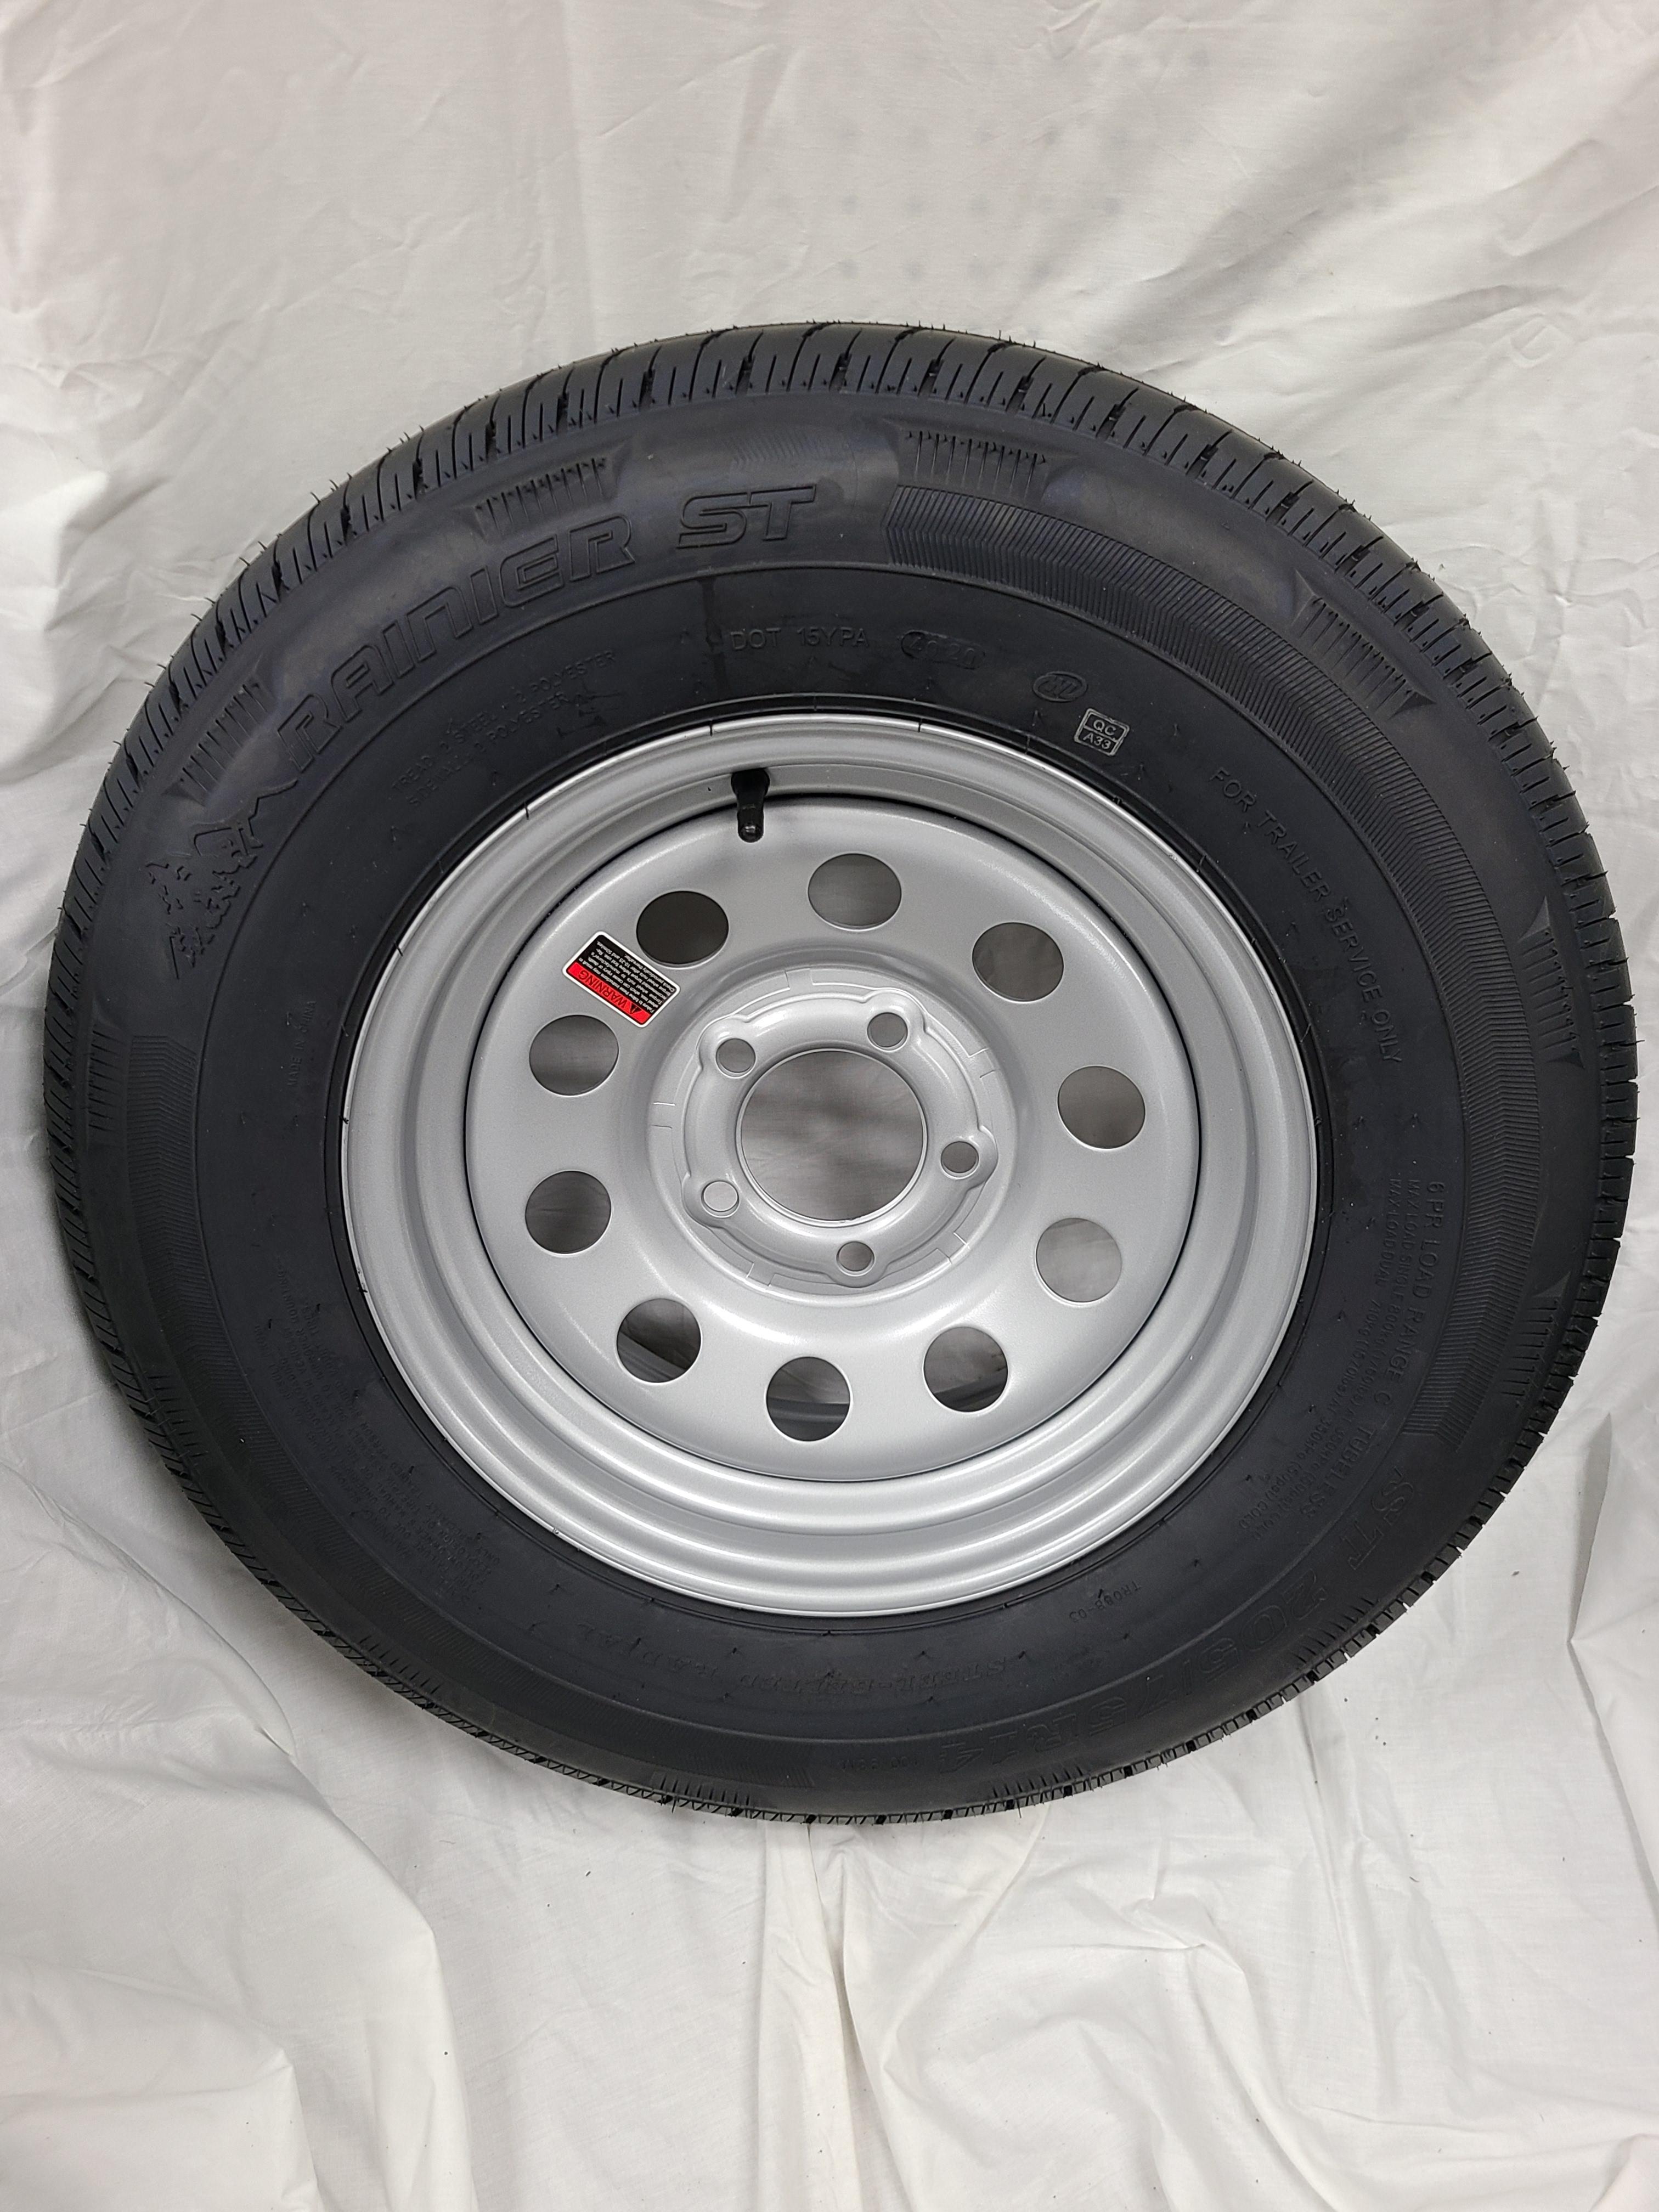 ST205/75/R14 Trailer Wheel Load Range C 5 Lug Silver mod